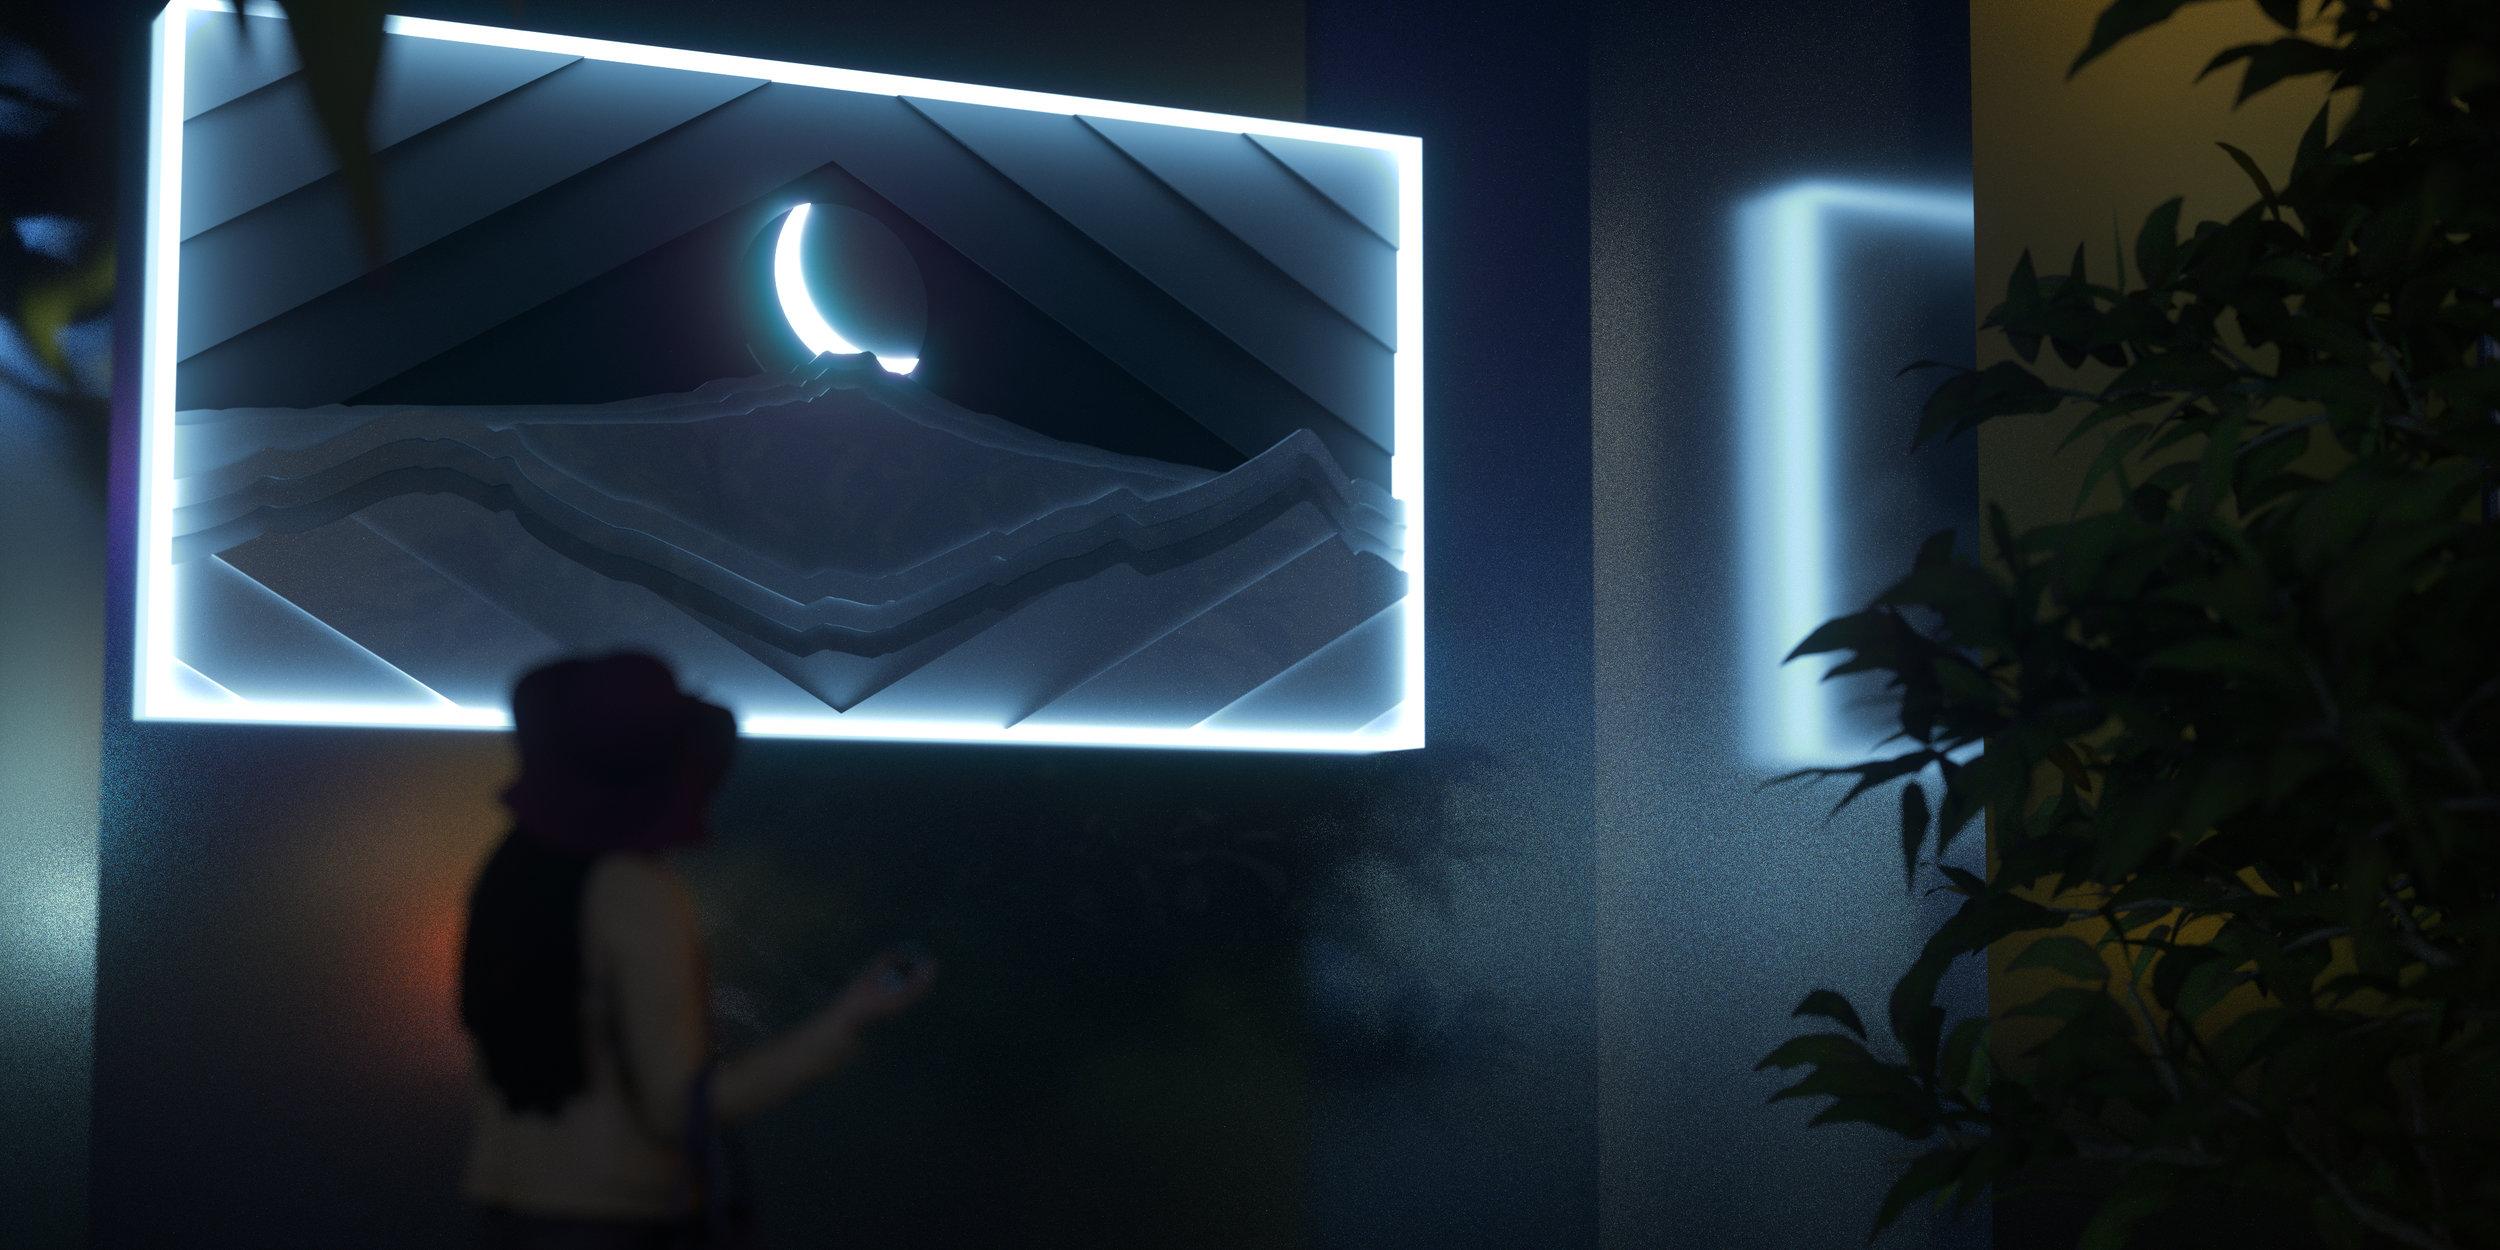 Nocturnal_BrightNights_promo.jpg